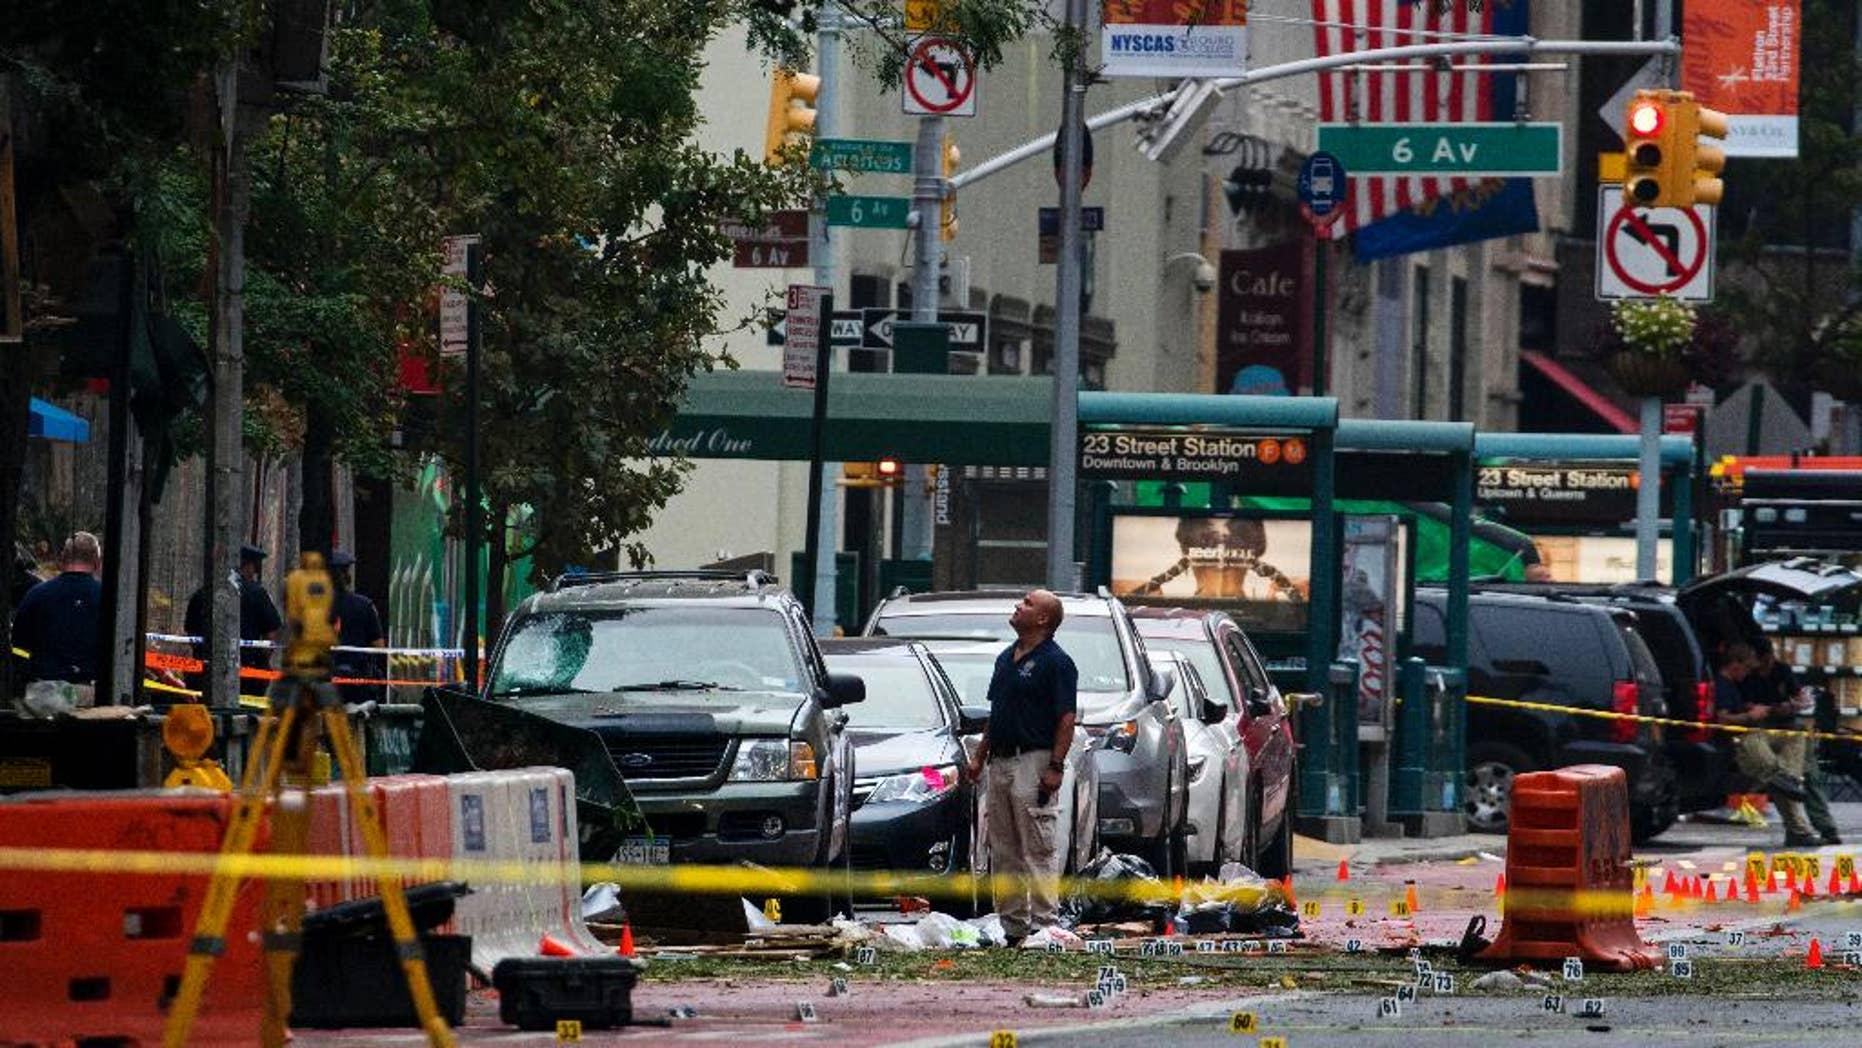 Sept. 18, 2016: Crime scene investigators work at the scene of Saturday's explosion in Manhattan's Chelsea neighborhood, in New York.